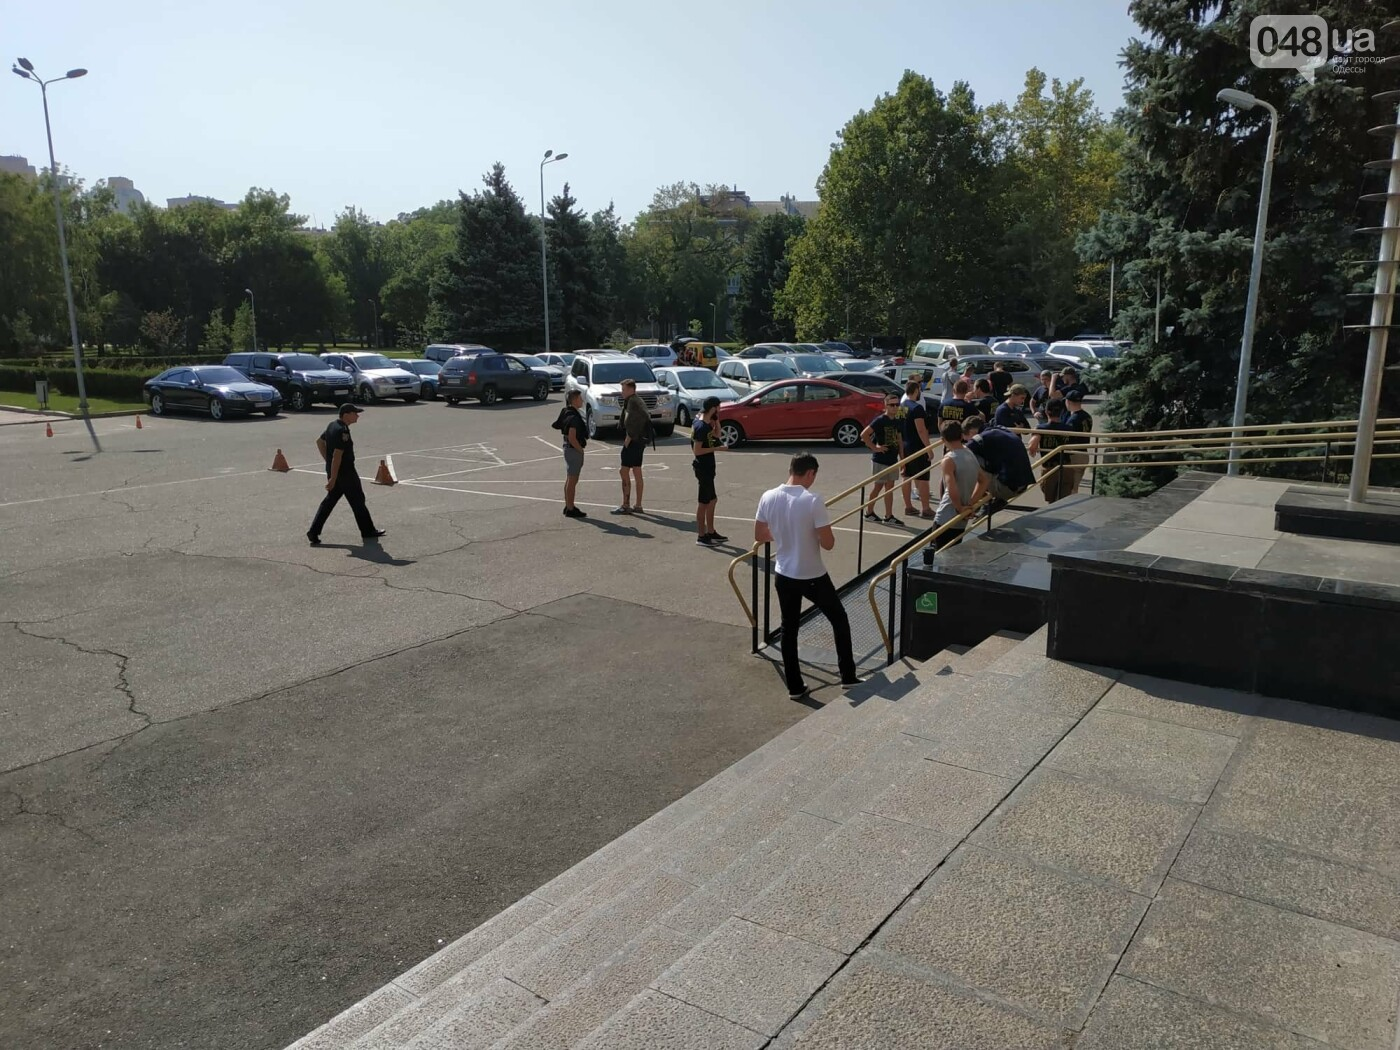 Стало известно, кто возглавил Одесский областной совет, - ФОТО, фото-4, Фото: Александр Жирносенко